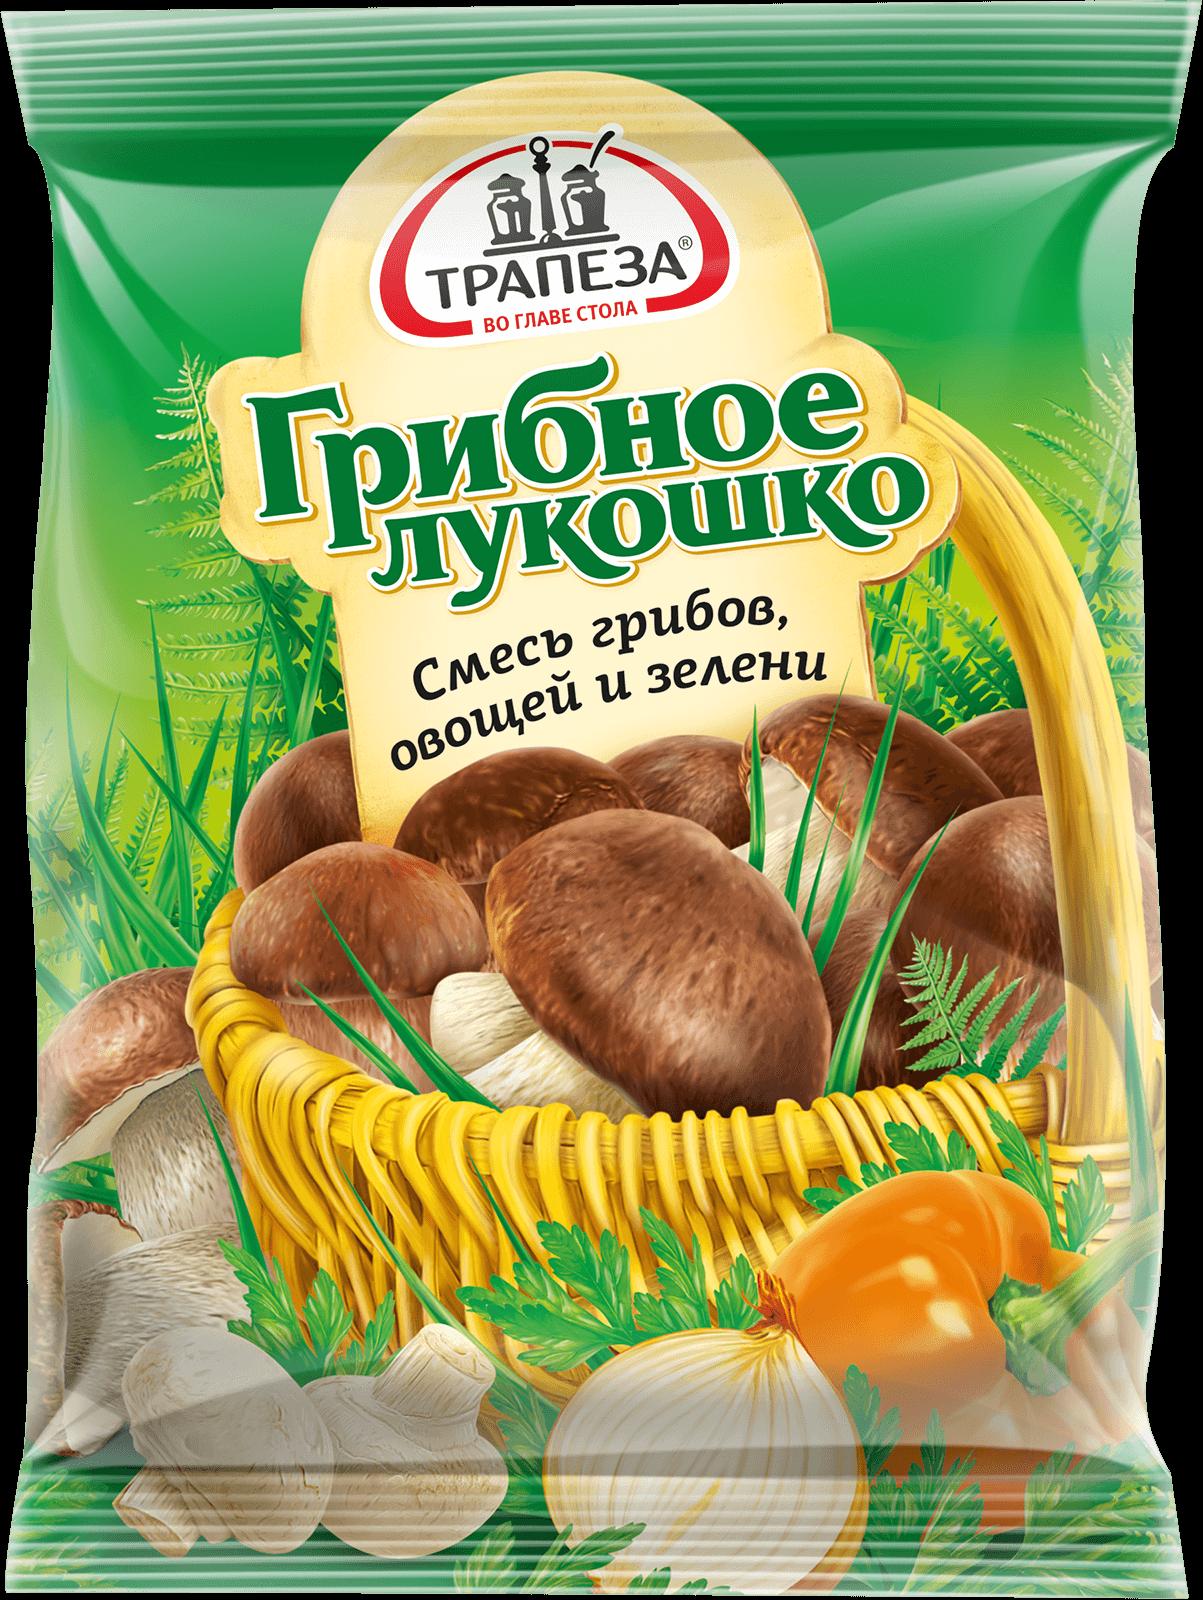 смесь грибное лукошко Трапеза 50г.